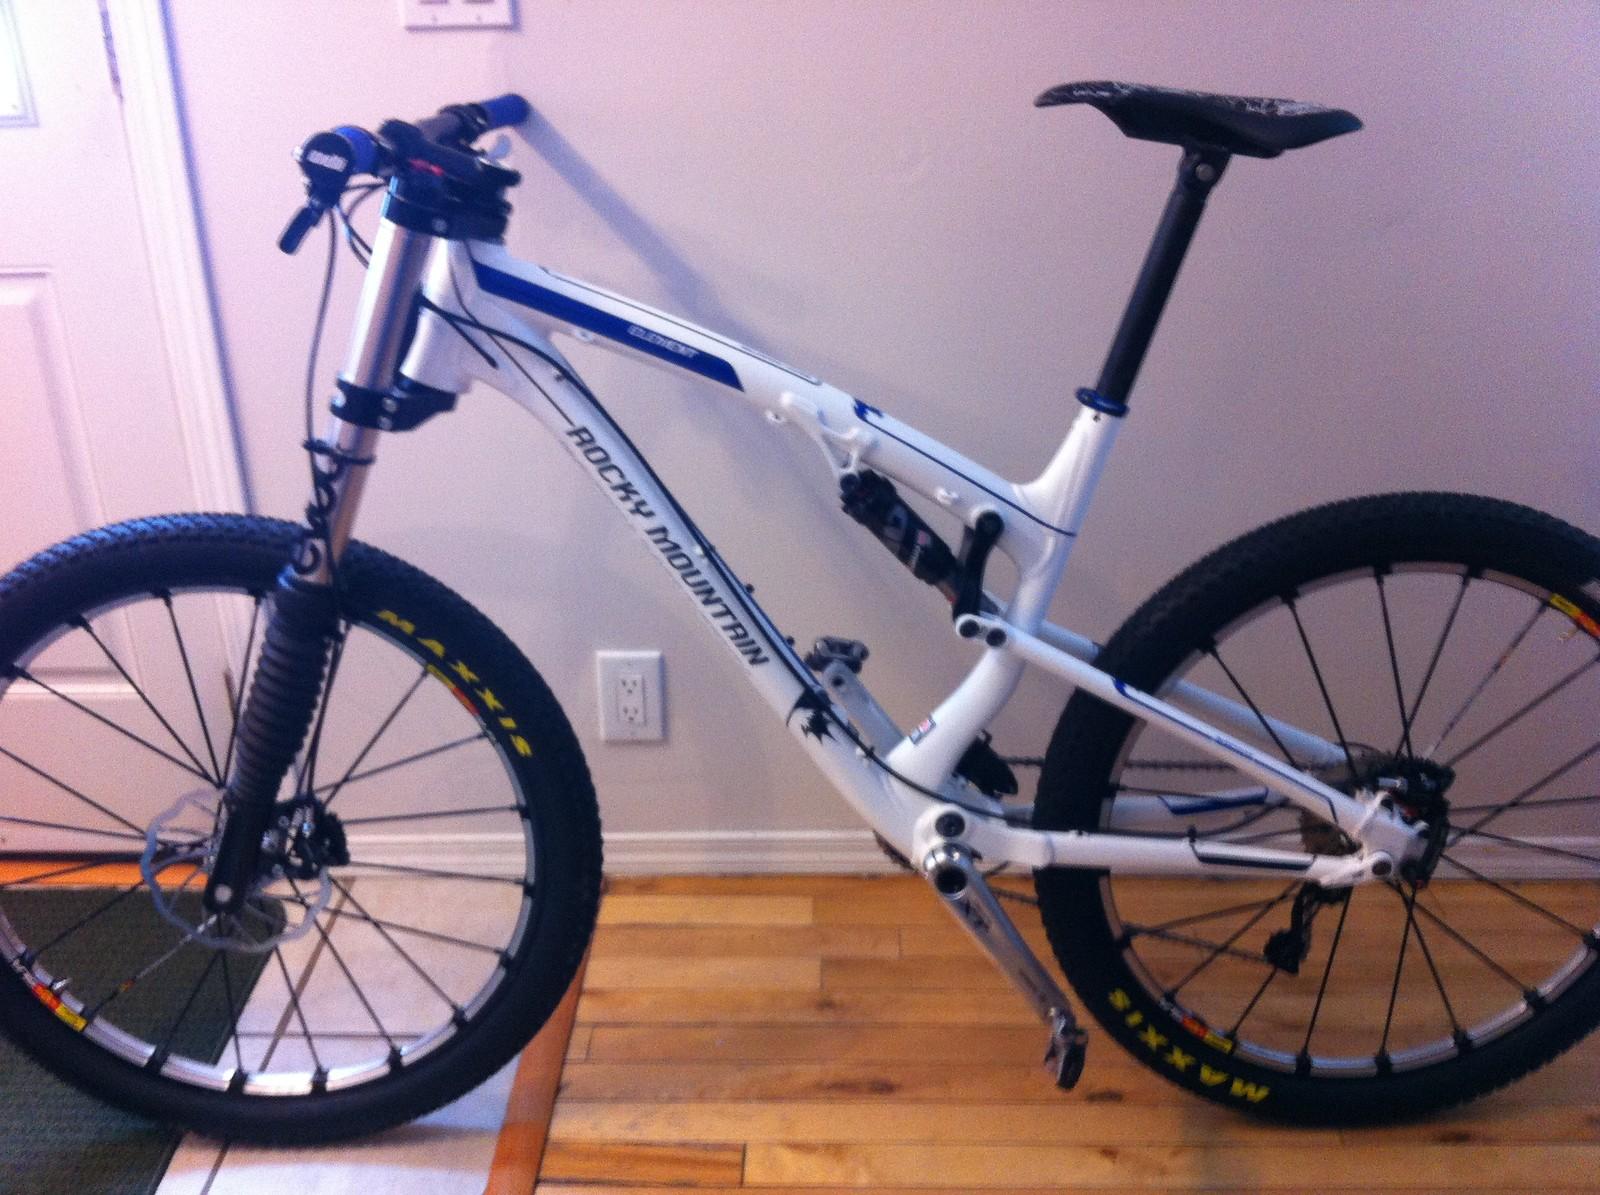 photo (1) - Brix326 - Mountain Biking Pictures - Vital MTB